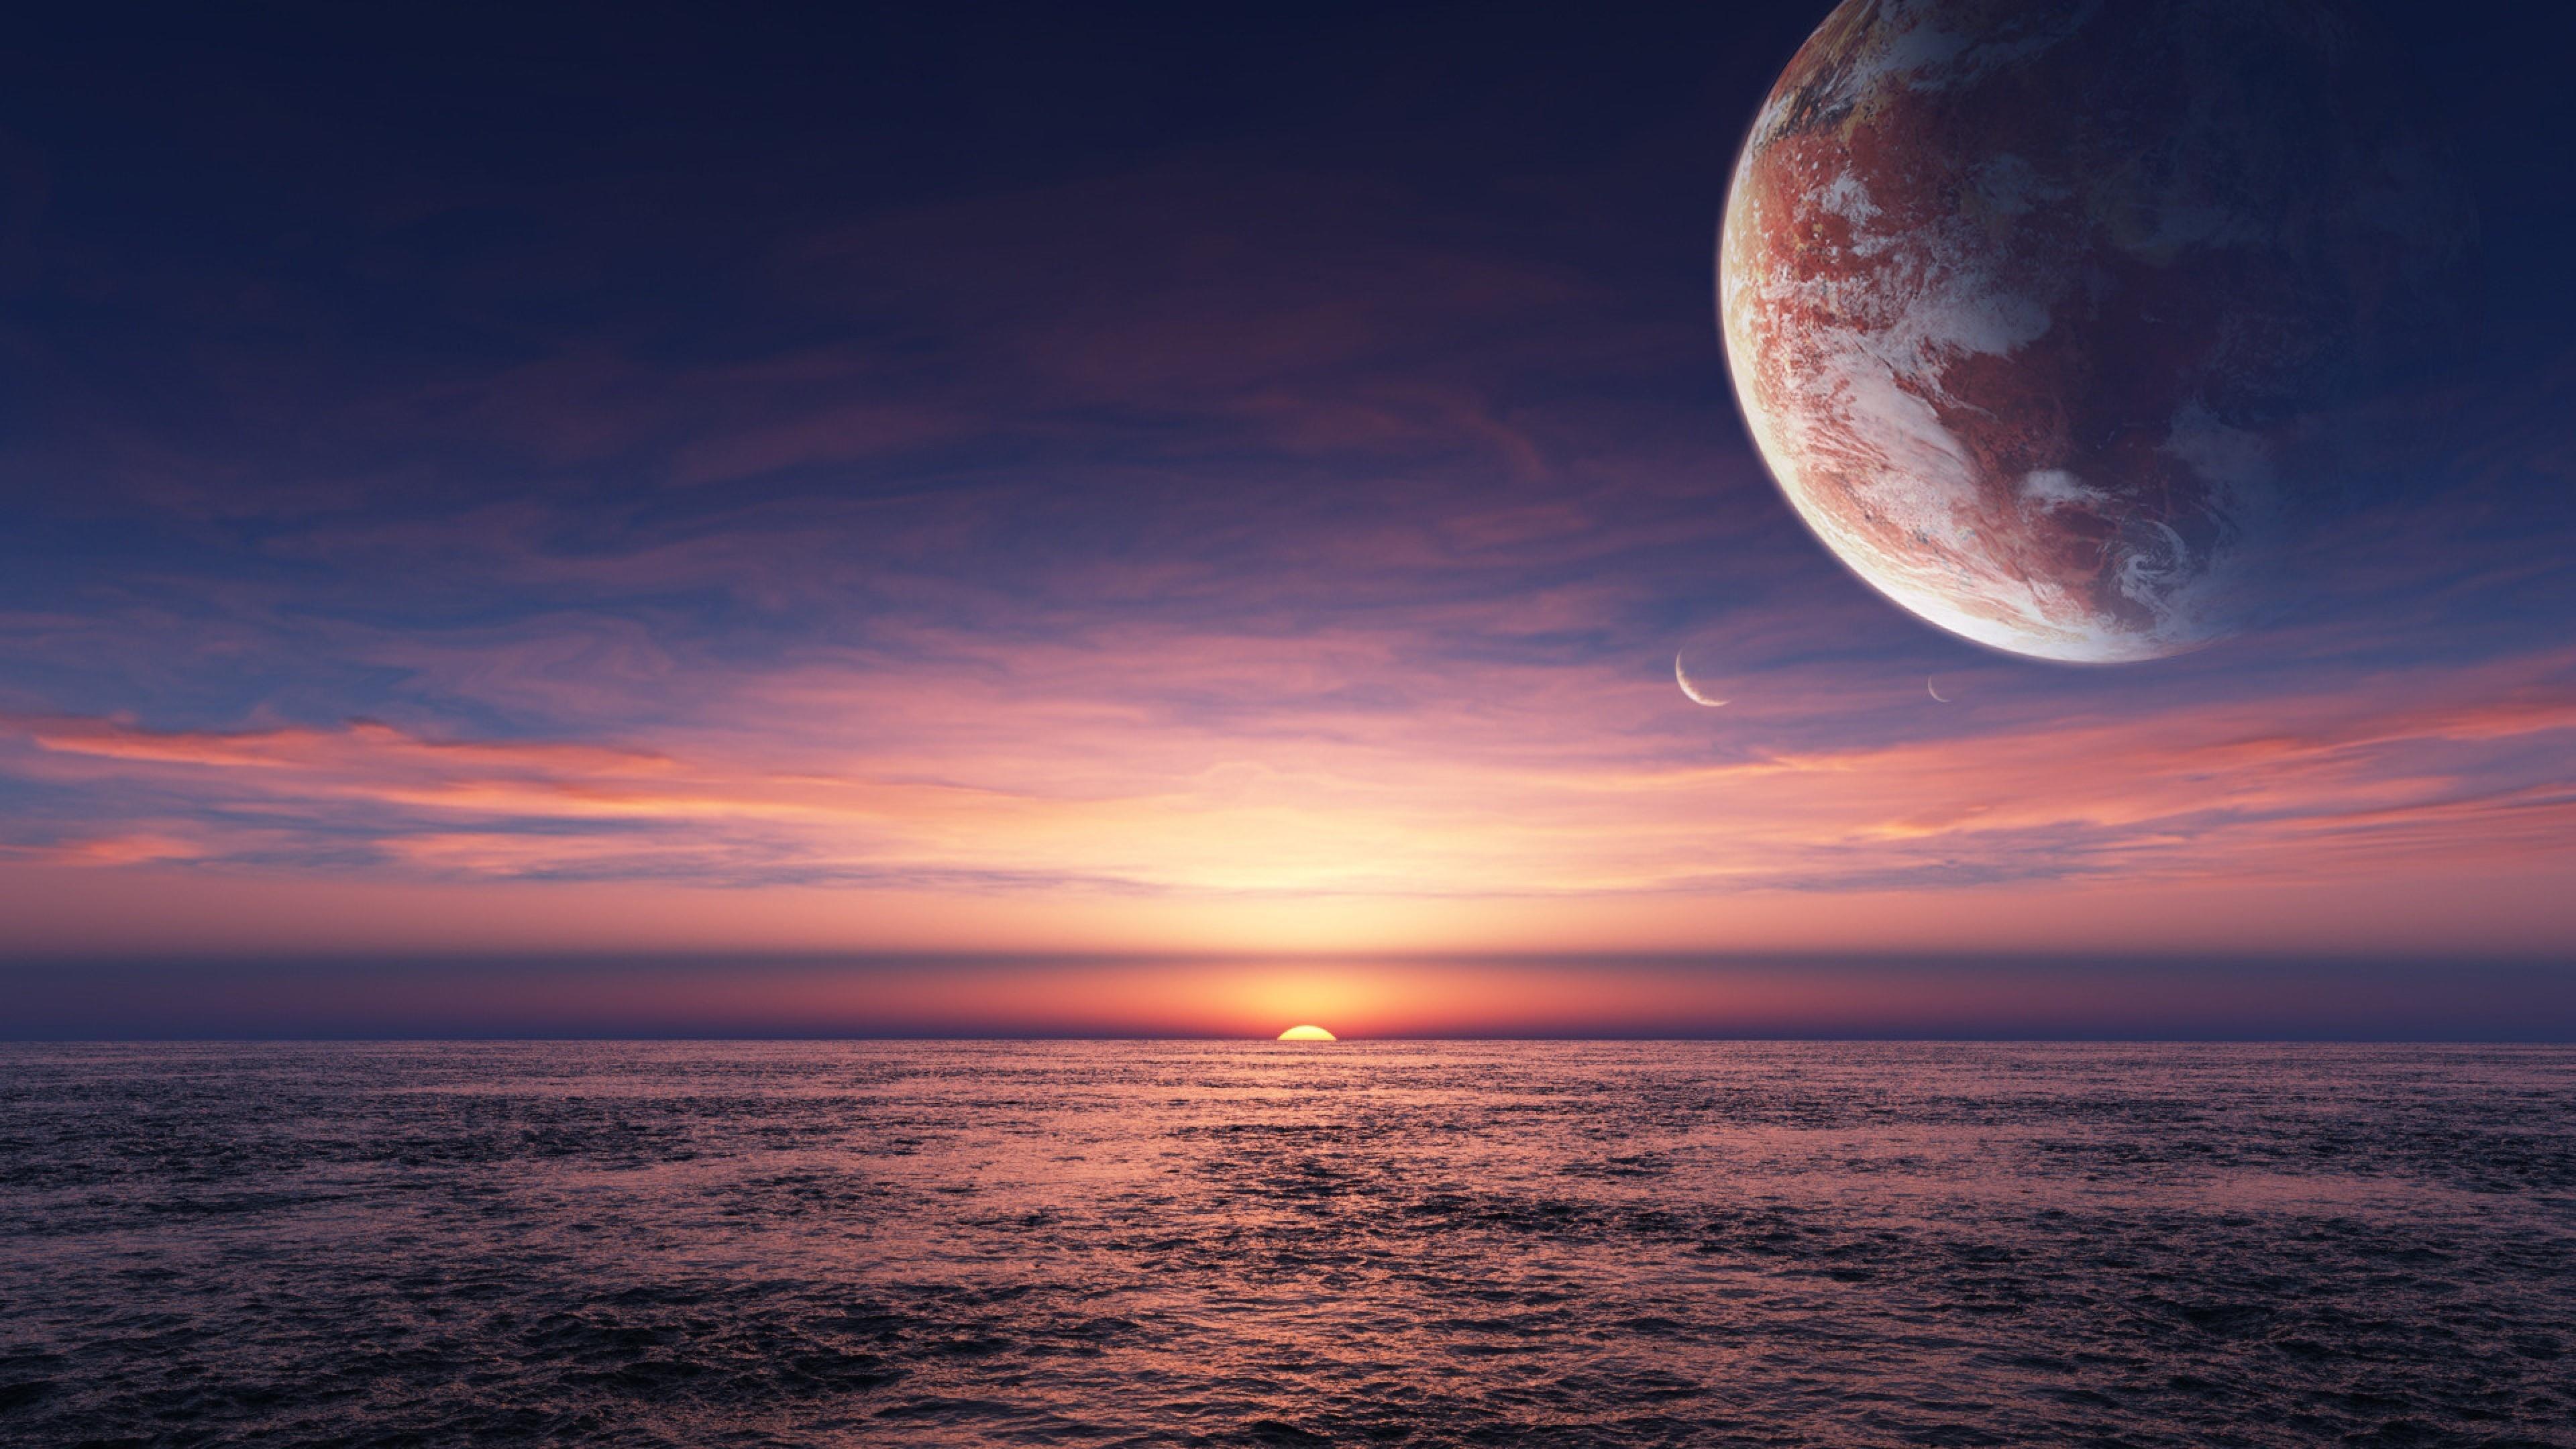 Sunset and moons - Fantasy landscape wallpaper